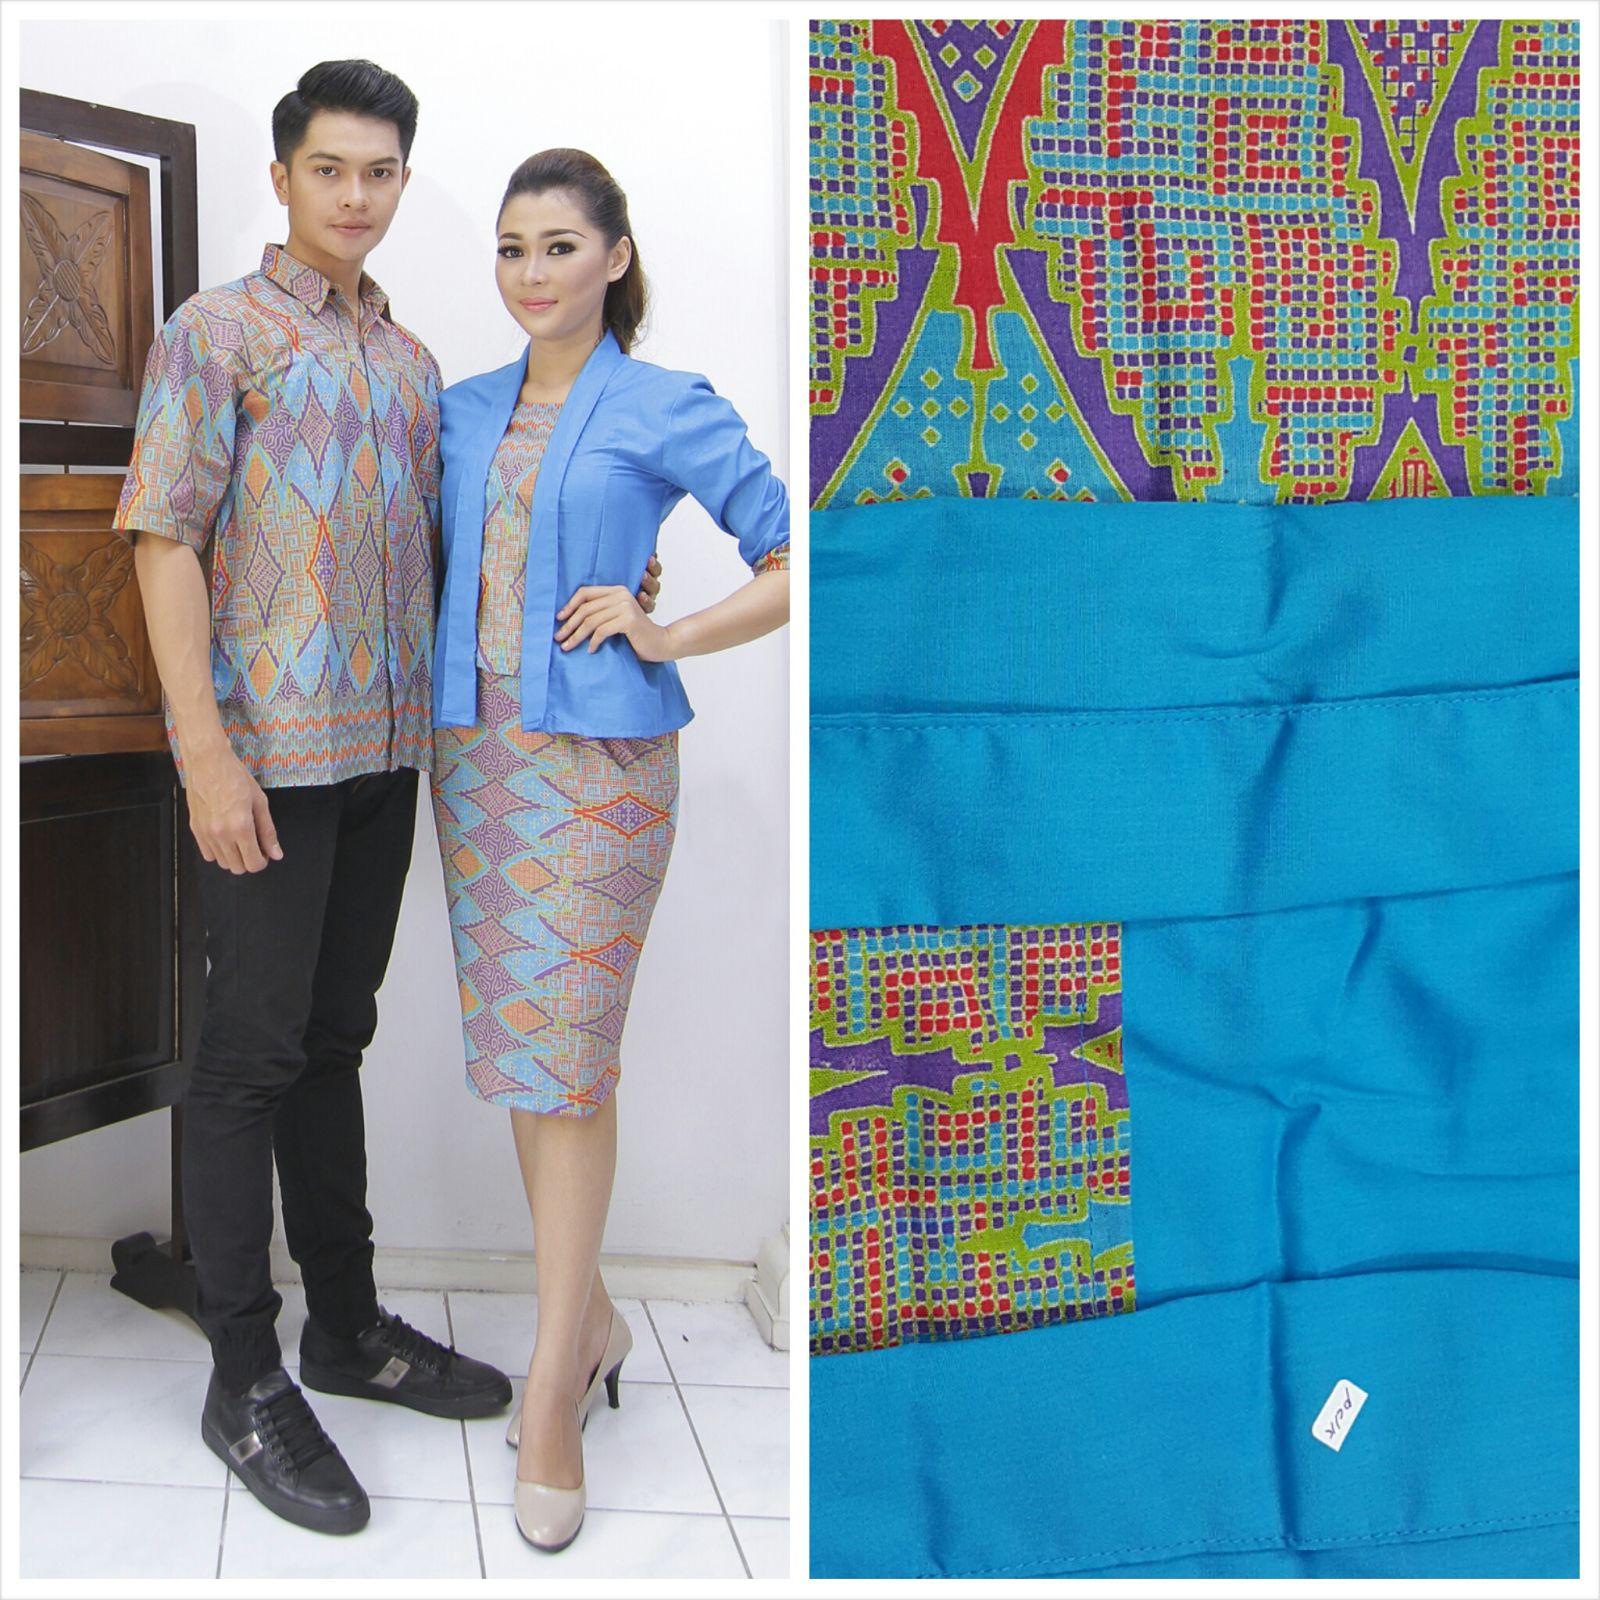 STELAN ROK BLOUSE ALLSIZE HEM M XL COG130 100G3G batiksolo murah seri ecer batik ayyu Http viollyneblink shop Fast Respon Pin BB